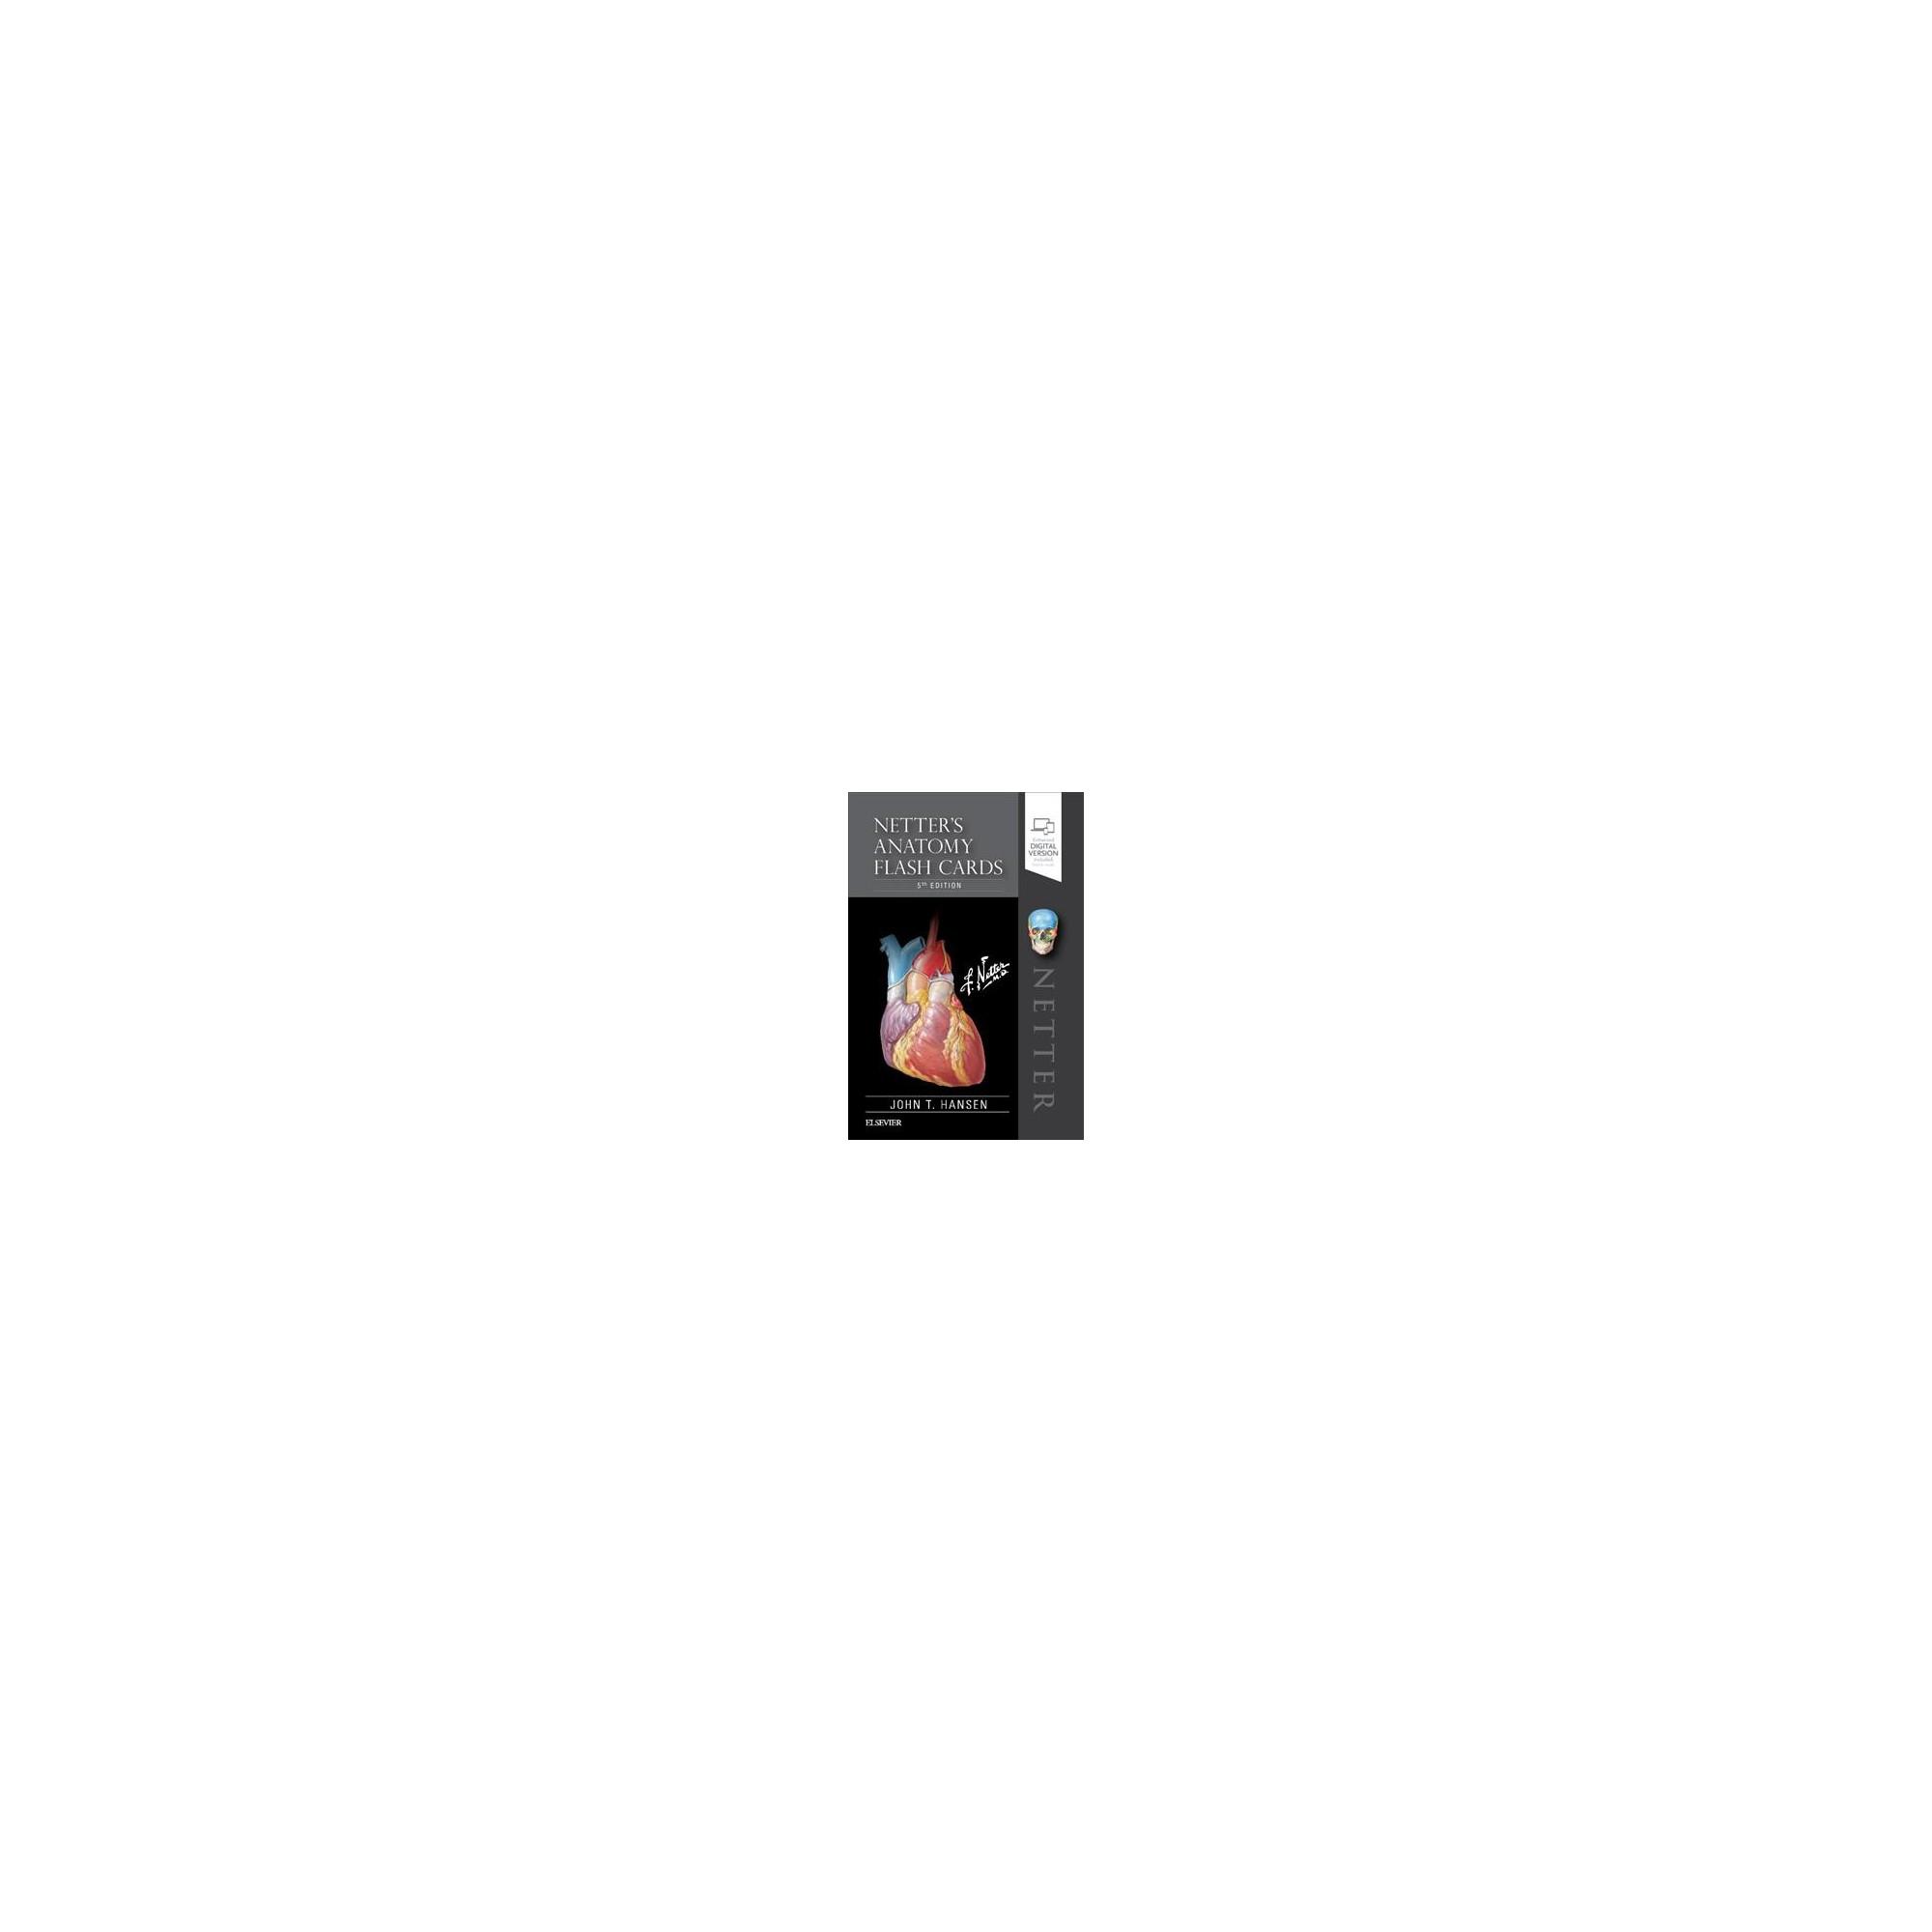 Netter\'s Anatomy Flash Cards (Paperback) (John T. Hansen) | Products